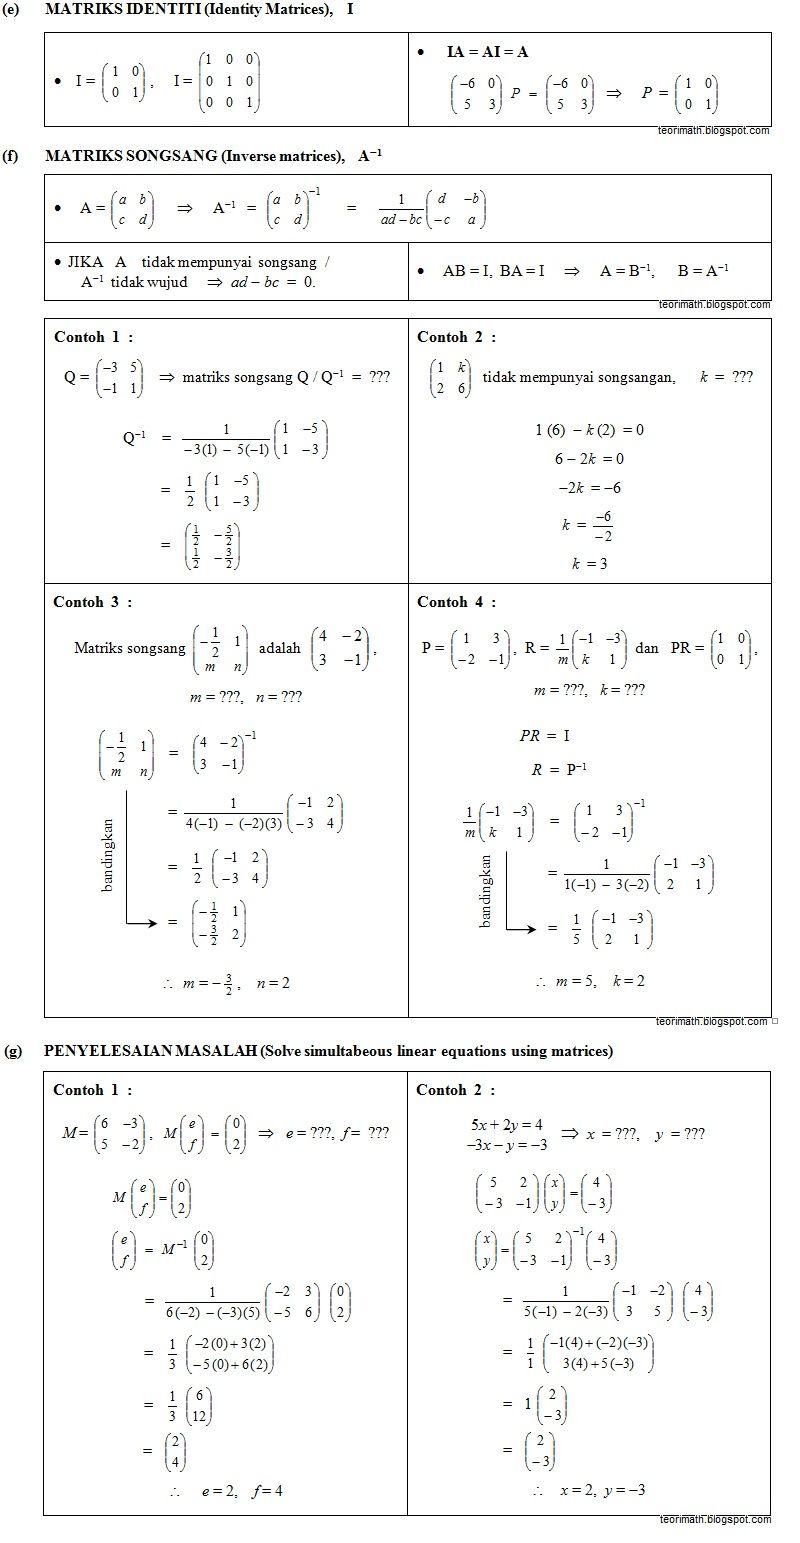 26 Matriks Matrices Matematika Kelas 5 Kalkulus Buku Catatan Matematika